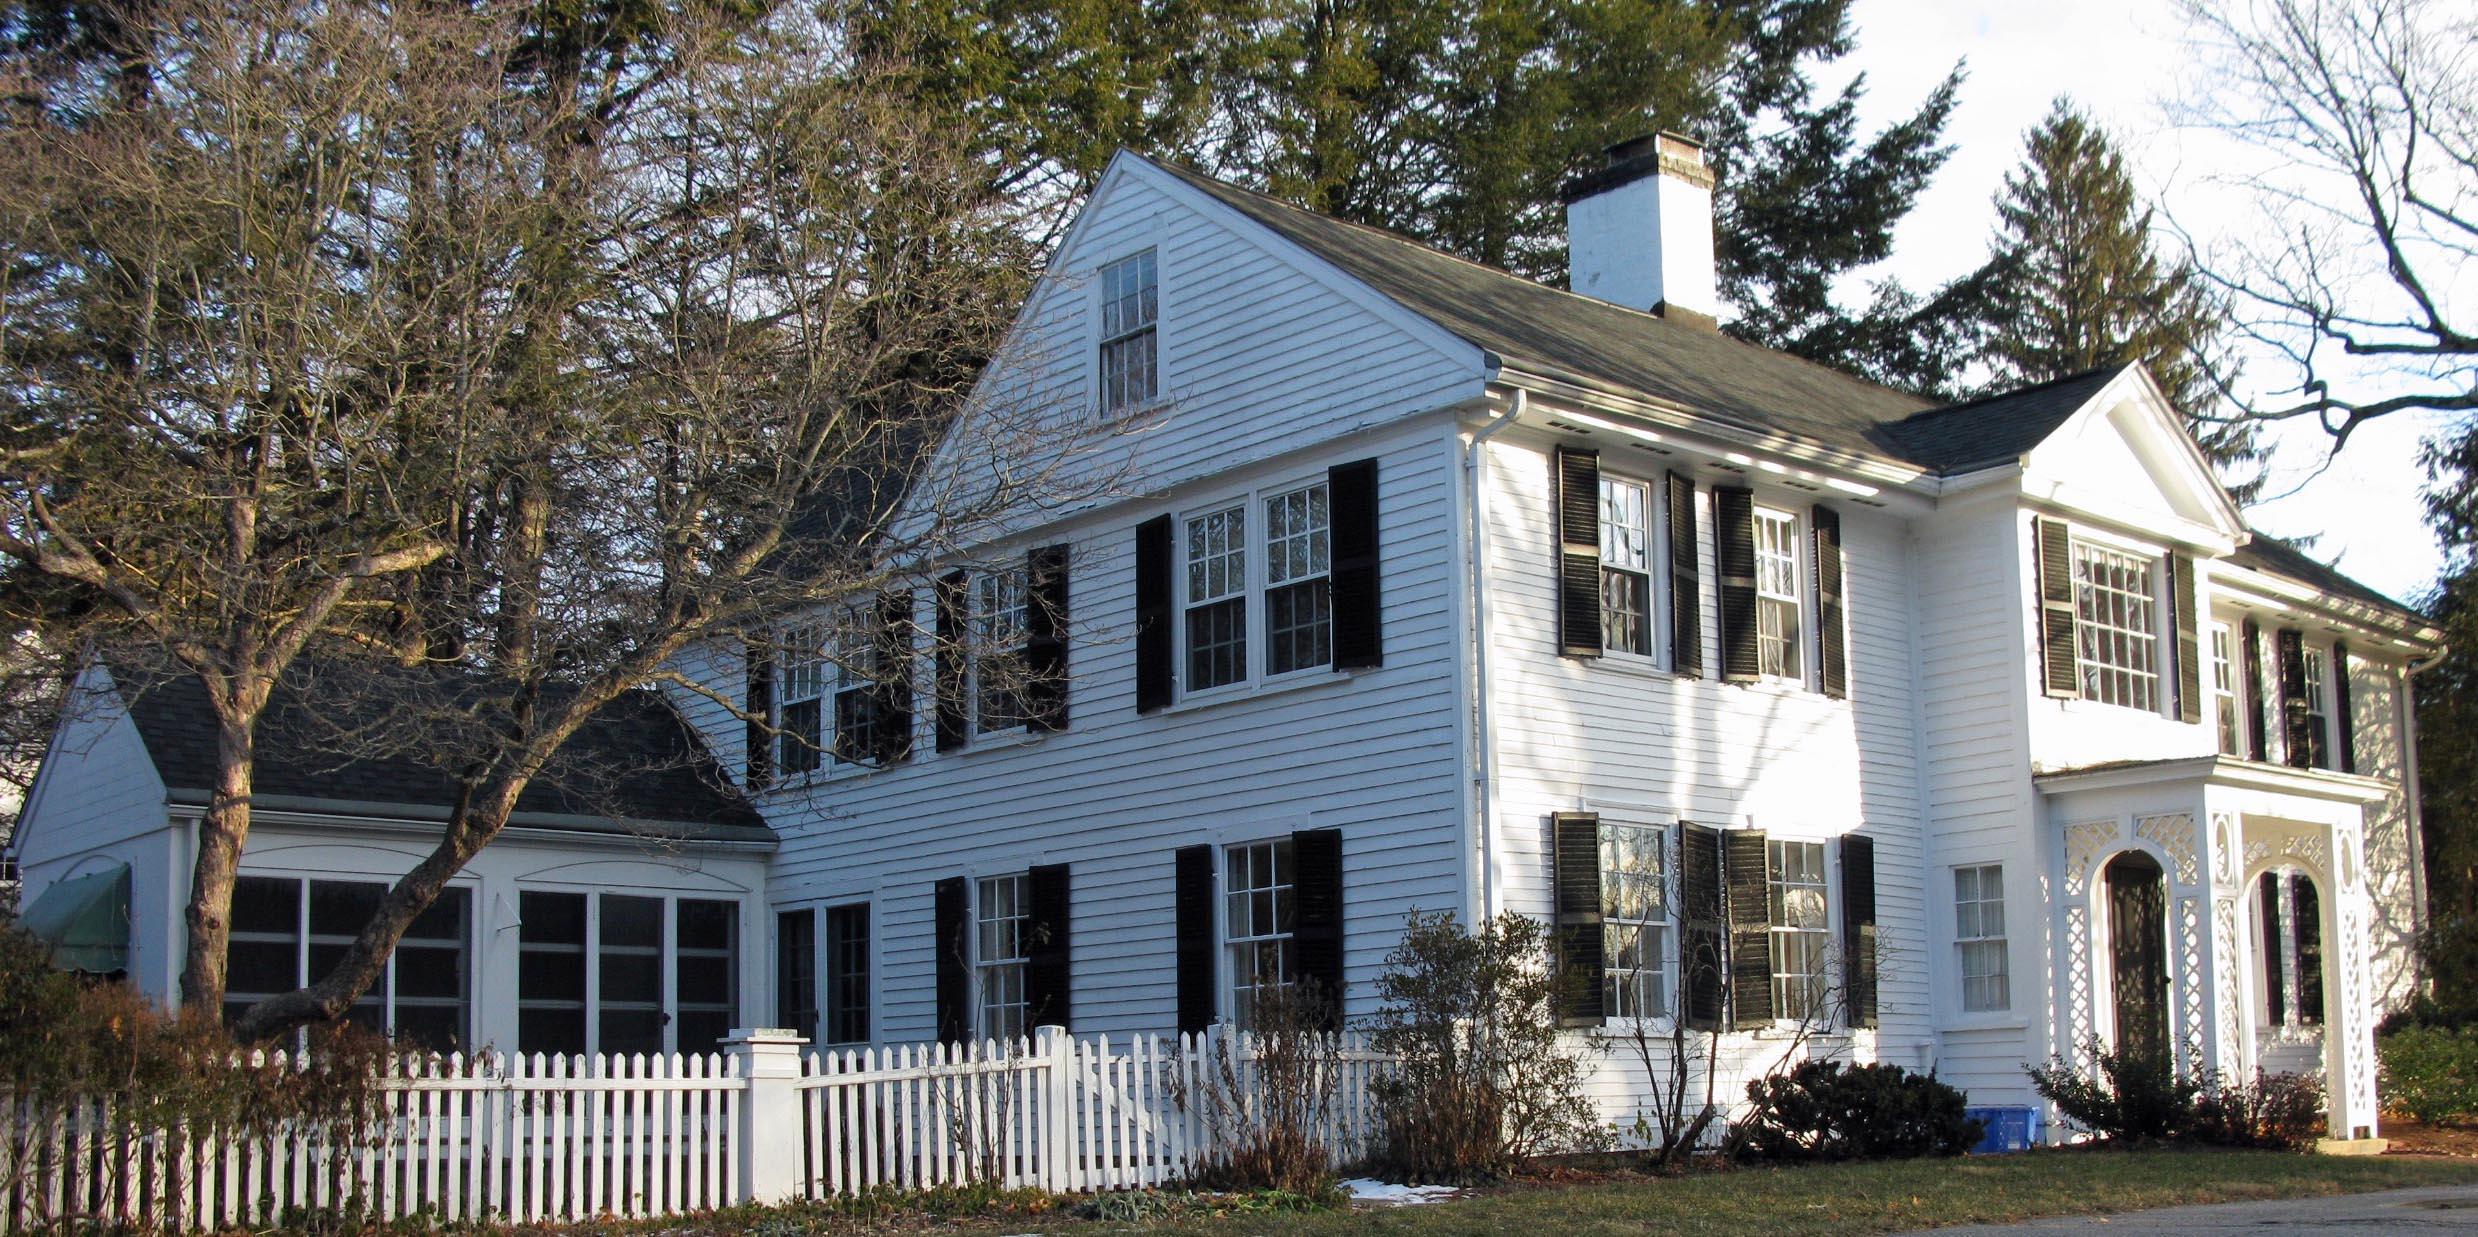 ANV.115 Higgins, Solomen - Abbot, George House 59 Central St., Andover MA 1734